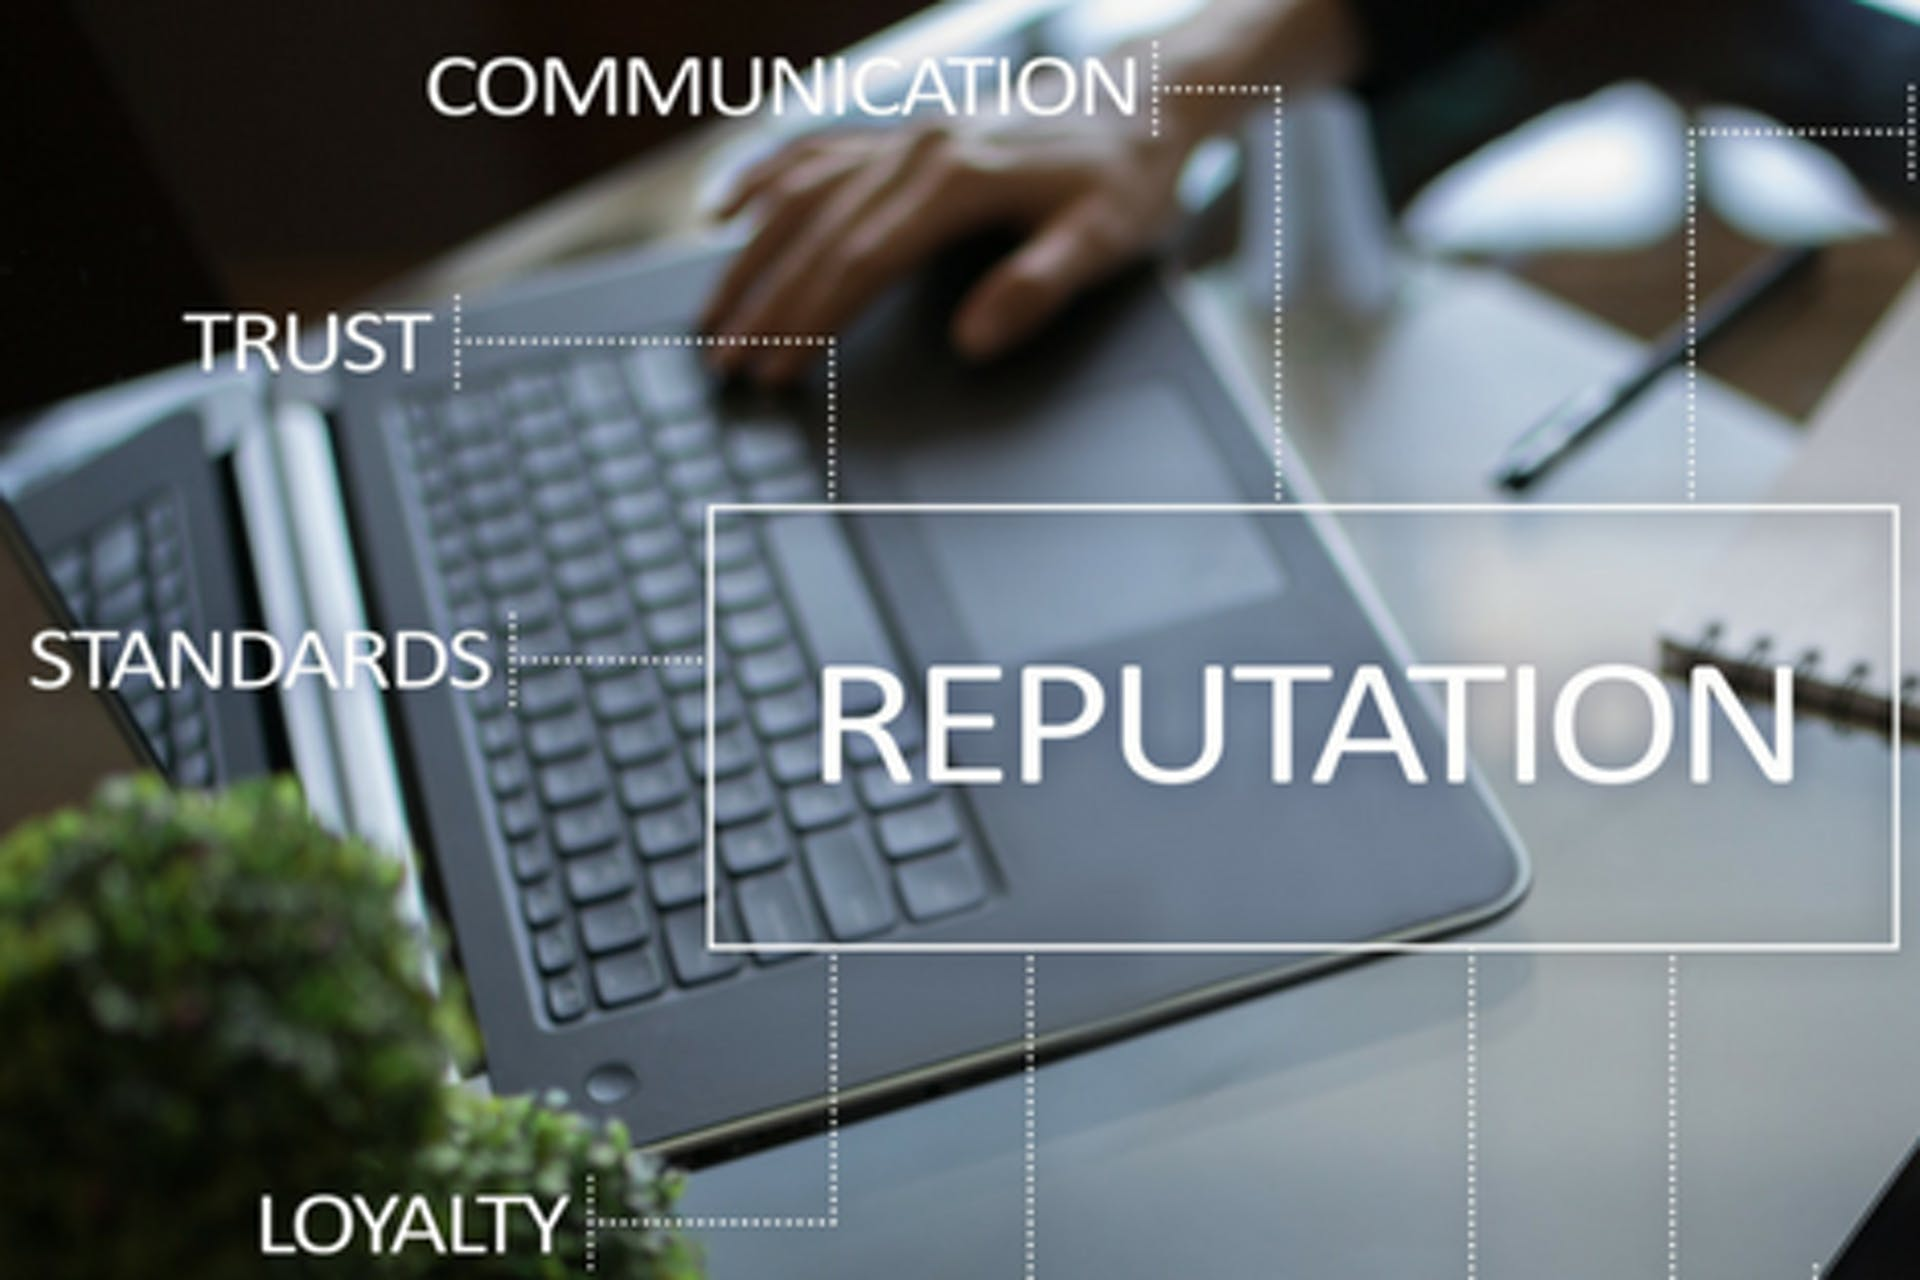 Reputation Communication Trust Standards Loyalty Laptop